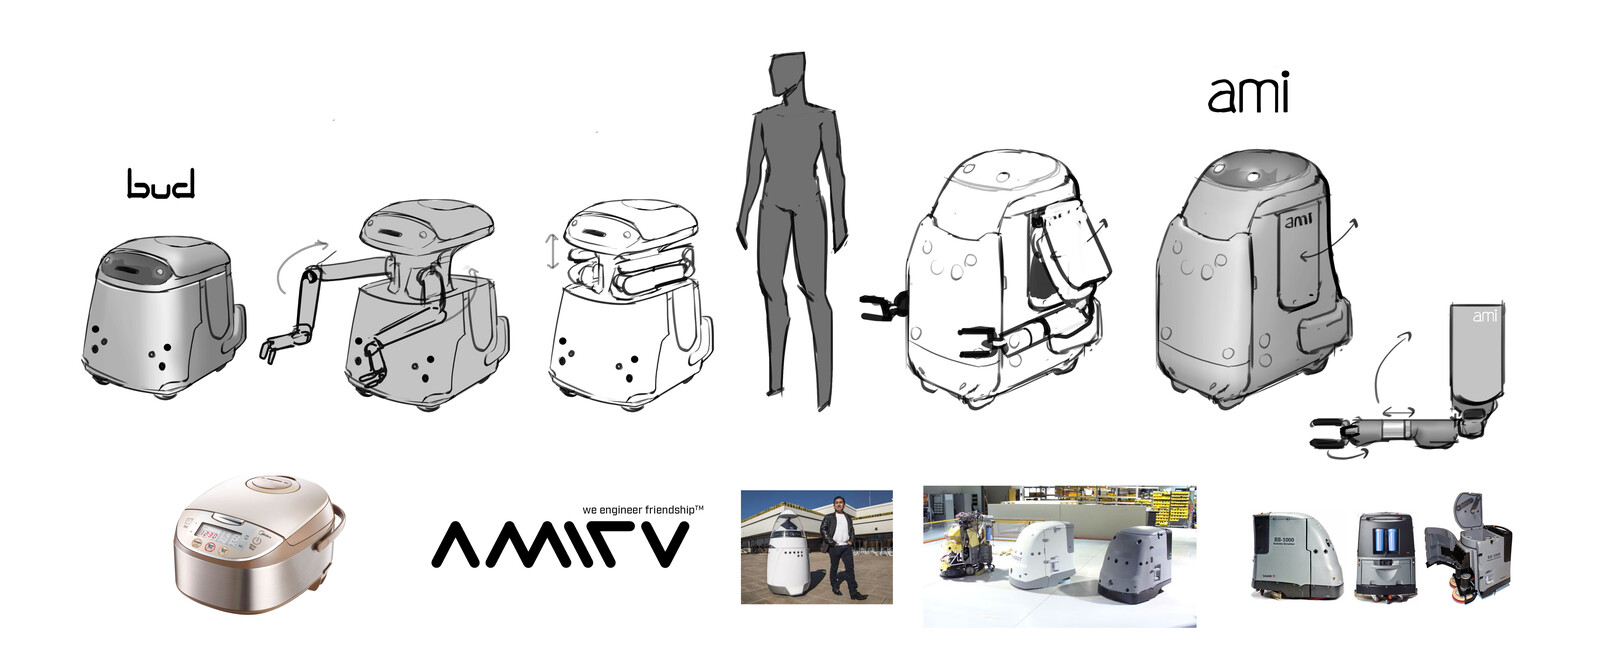 Friendly AMITU robot sketches